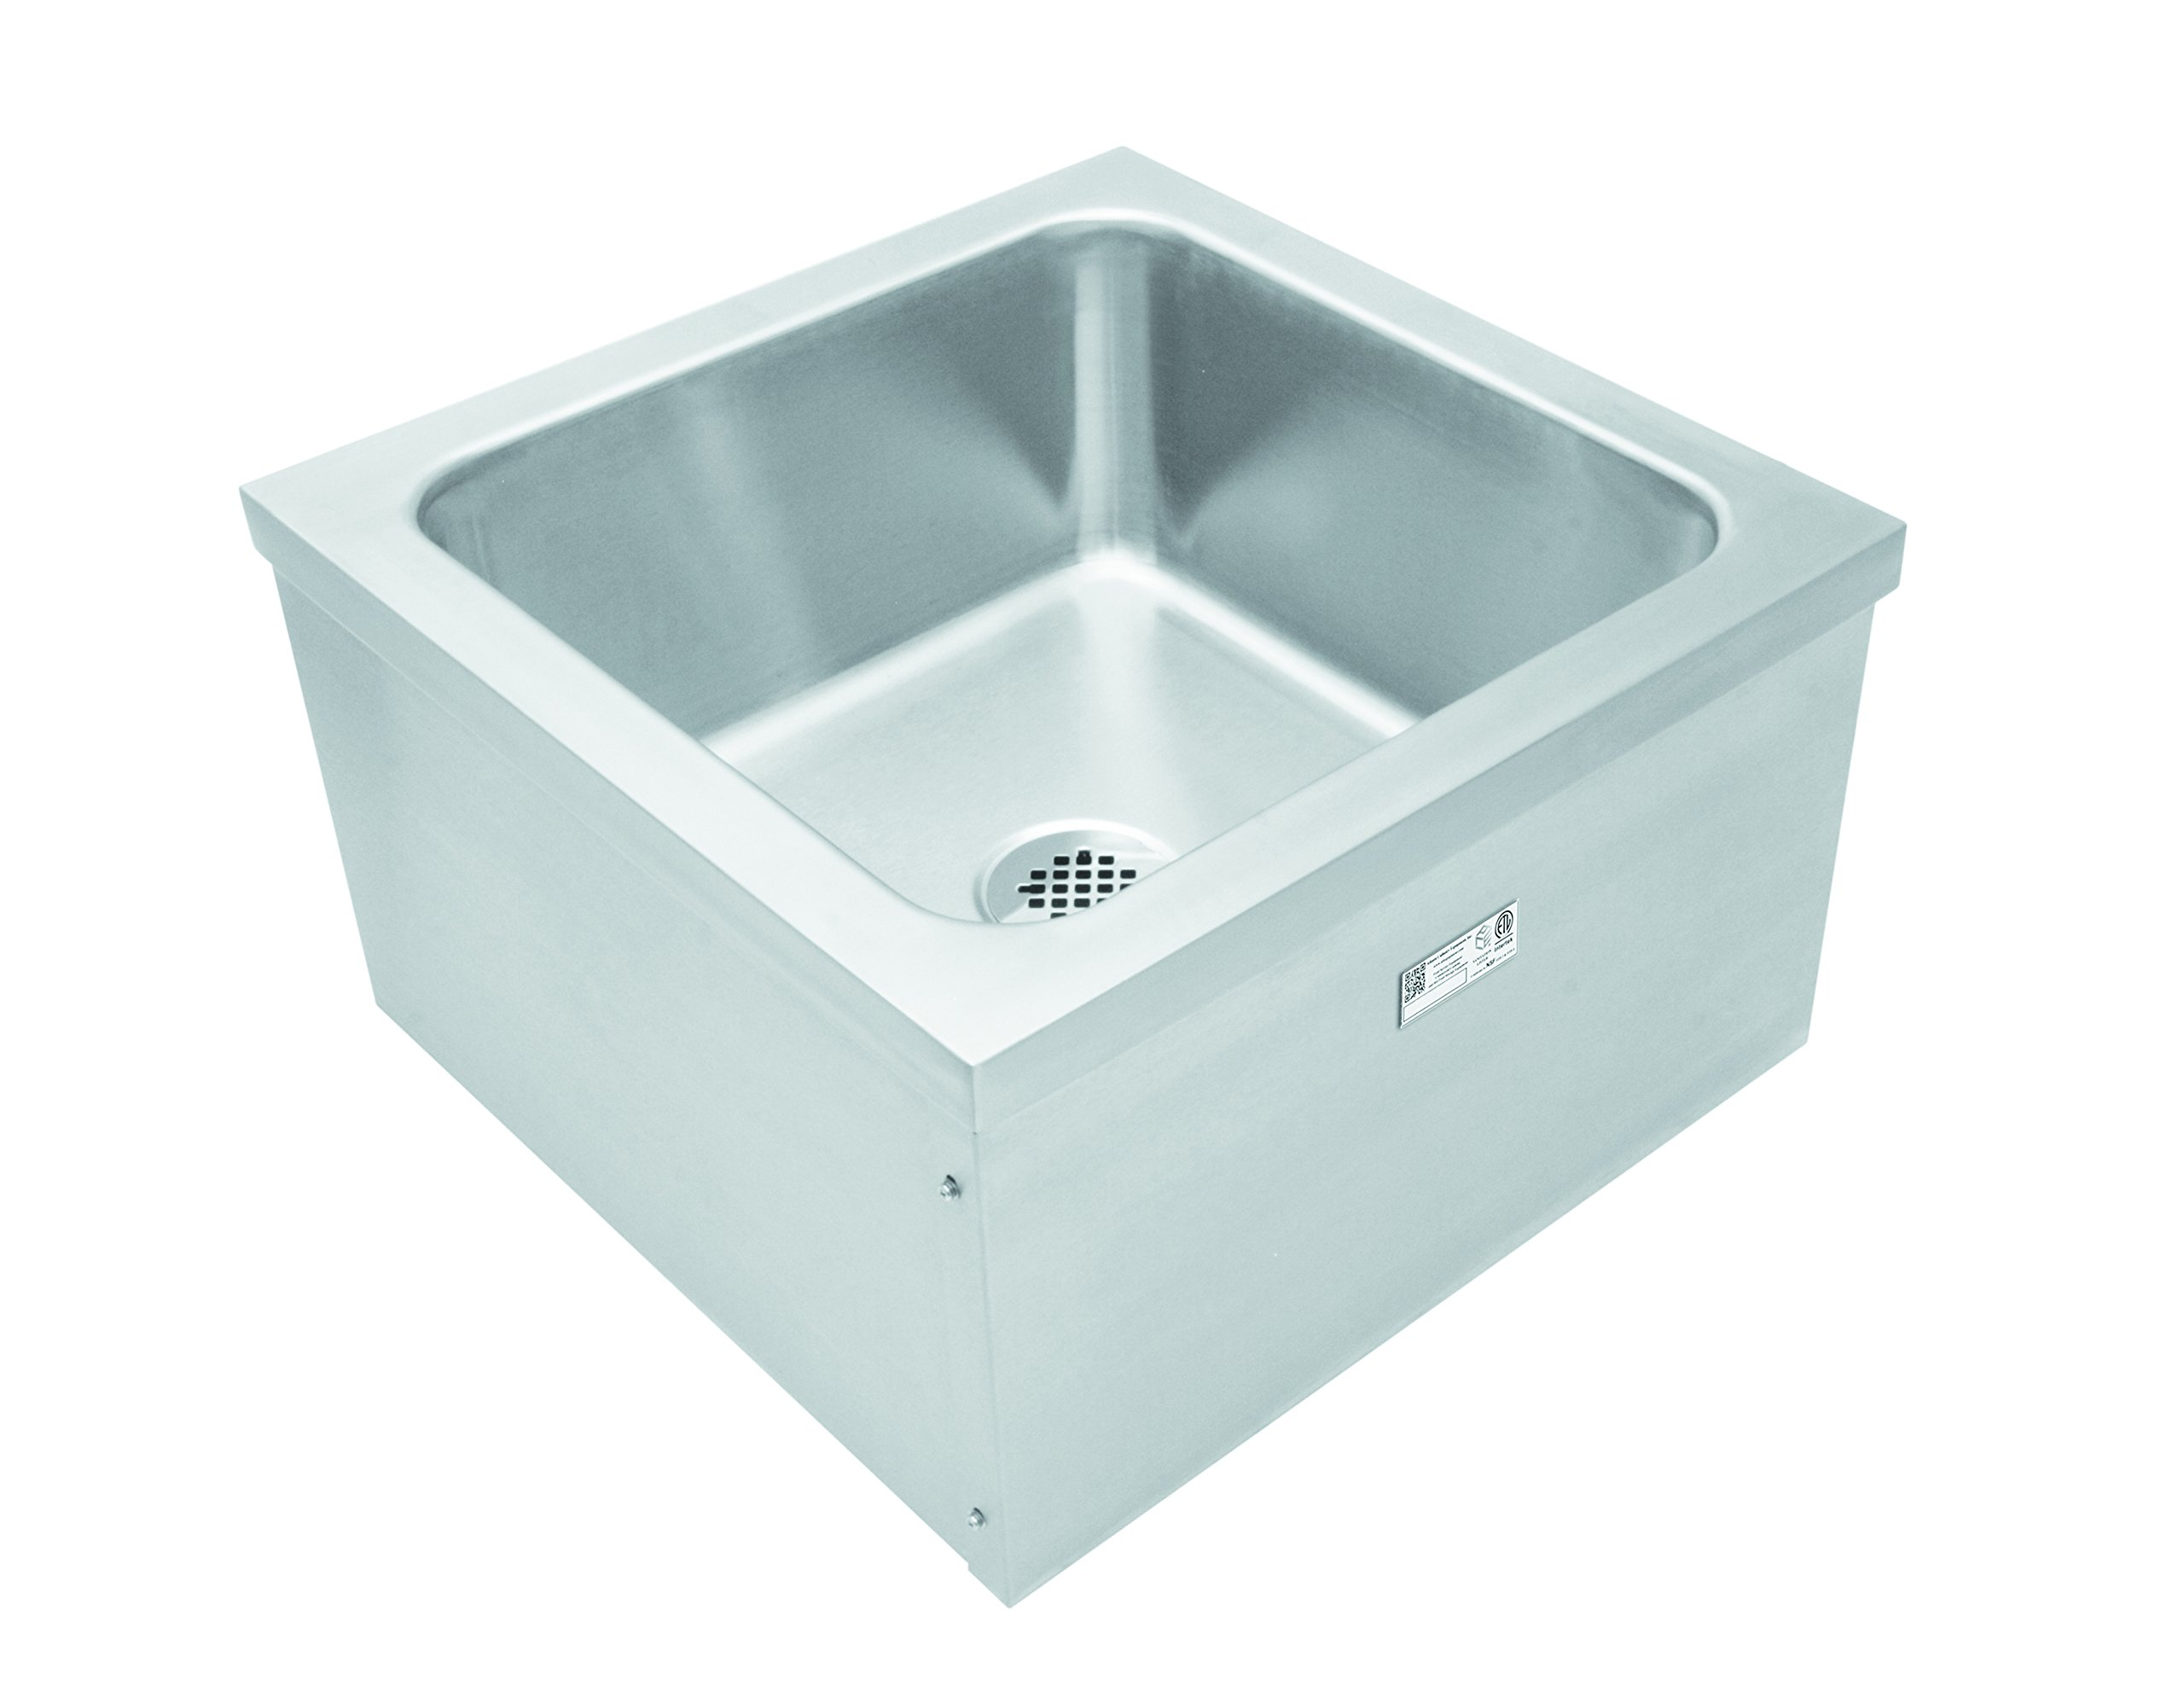 "Stainless Steel Floor Mount Mop Sink SE2424FM (24"" x 24"" x 14"")"